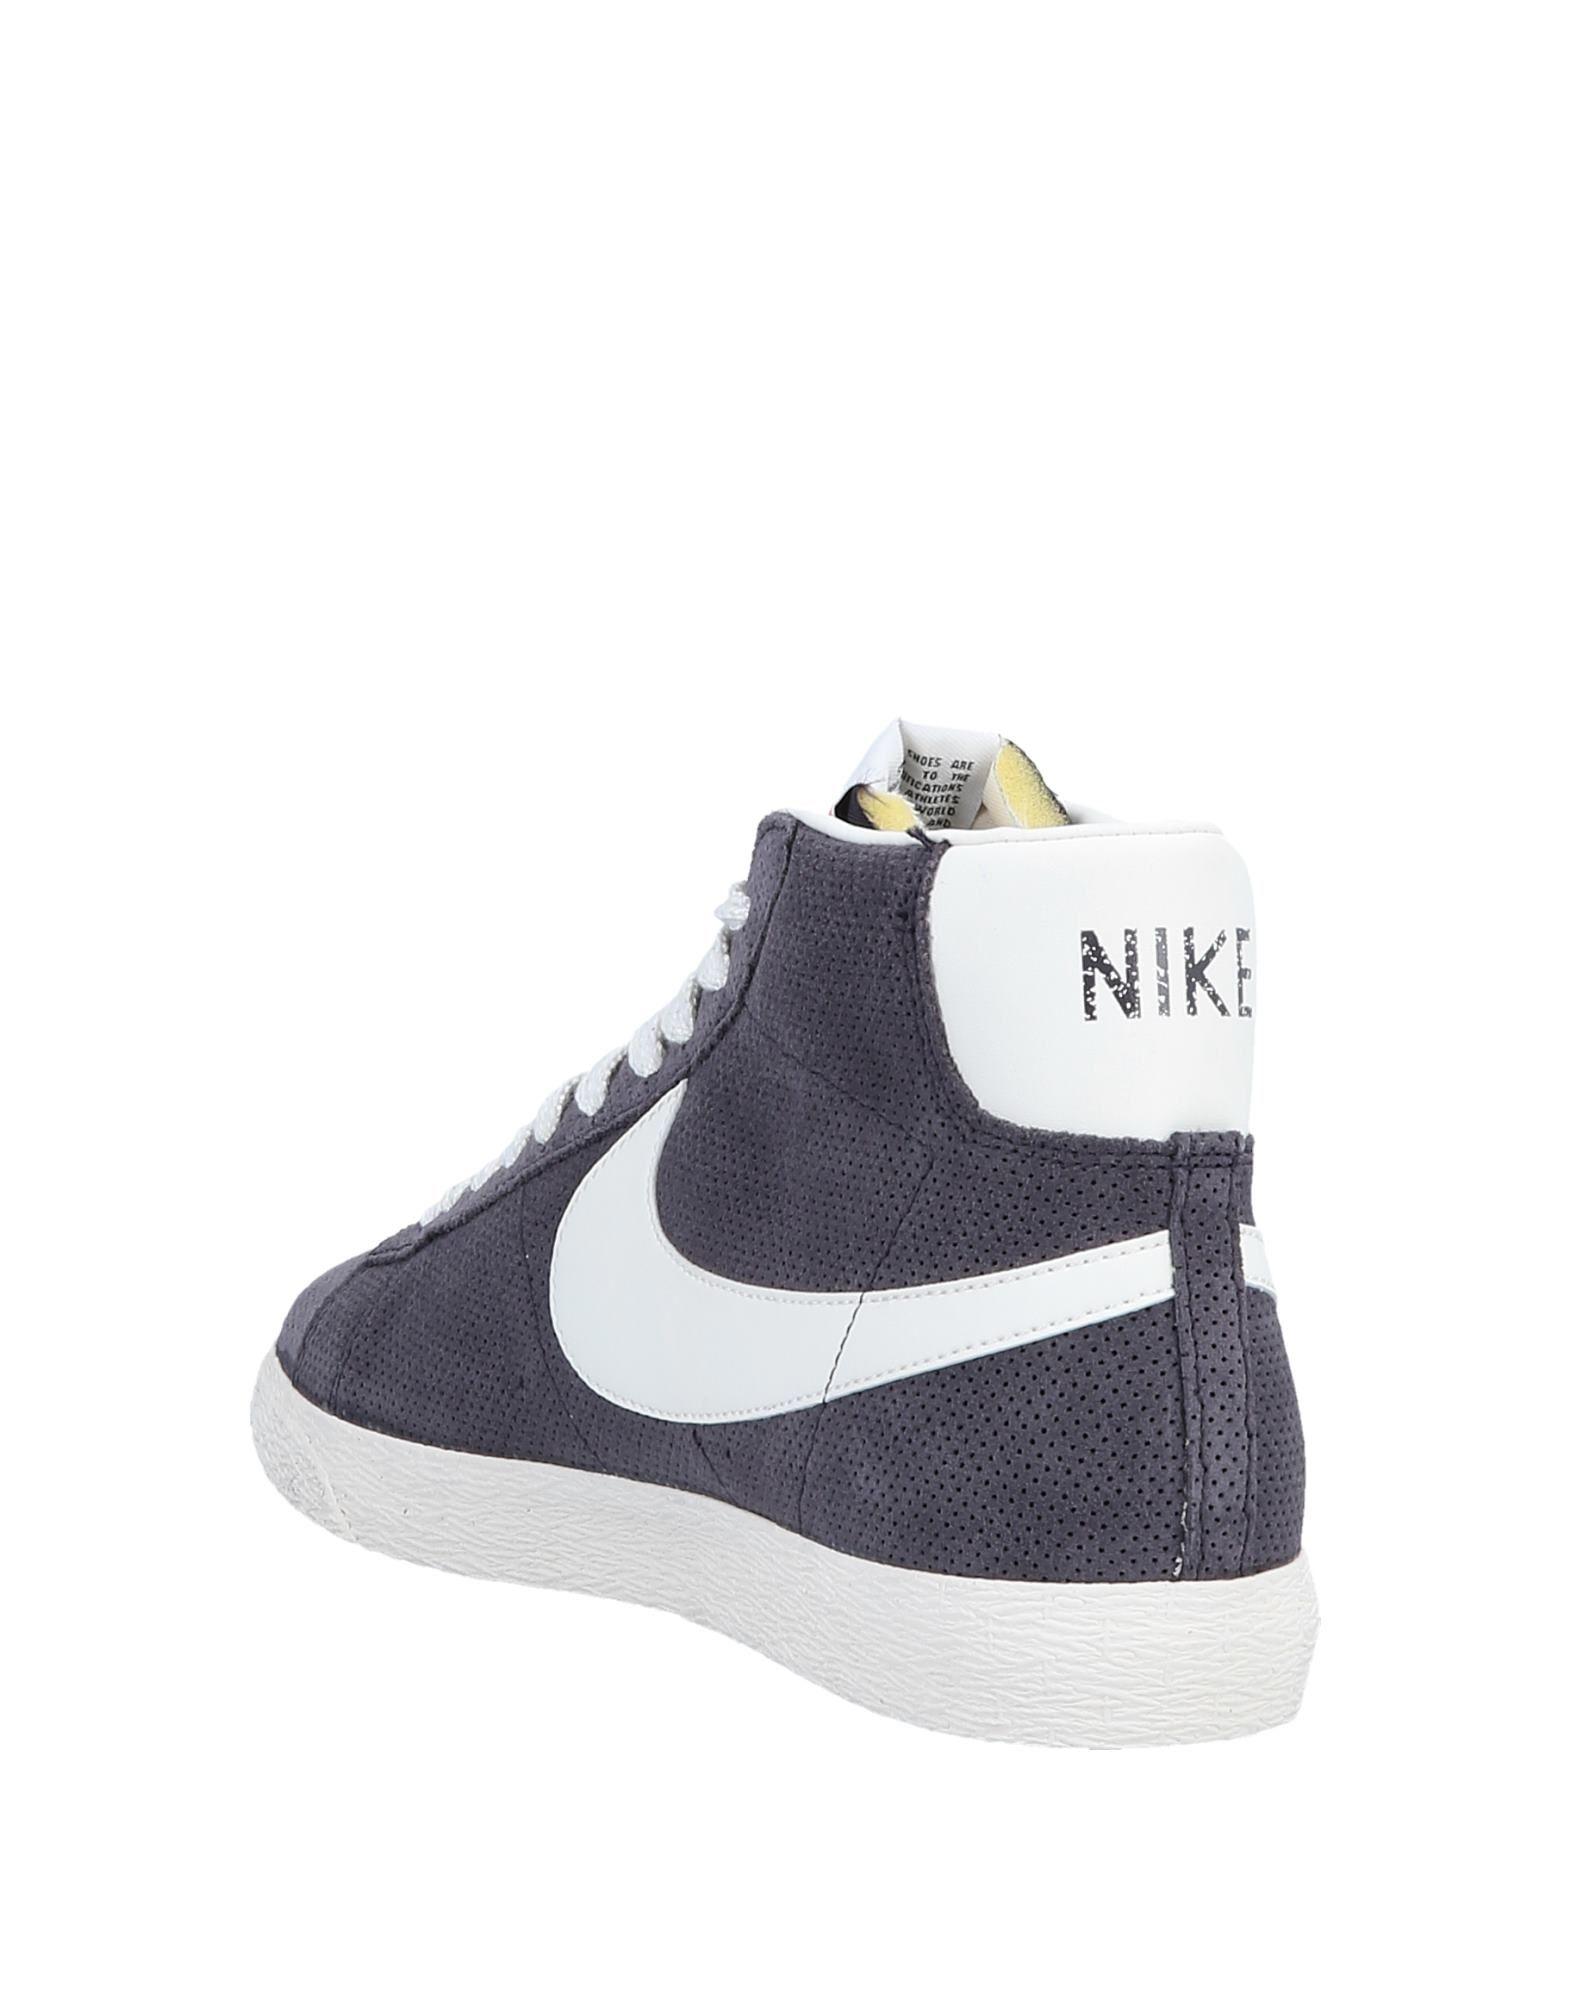 Rabatt echte Schuhe Herren Nike Sneakers Herren Schuhe  11572897DV d9ec80